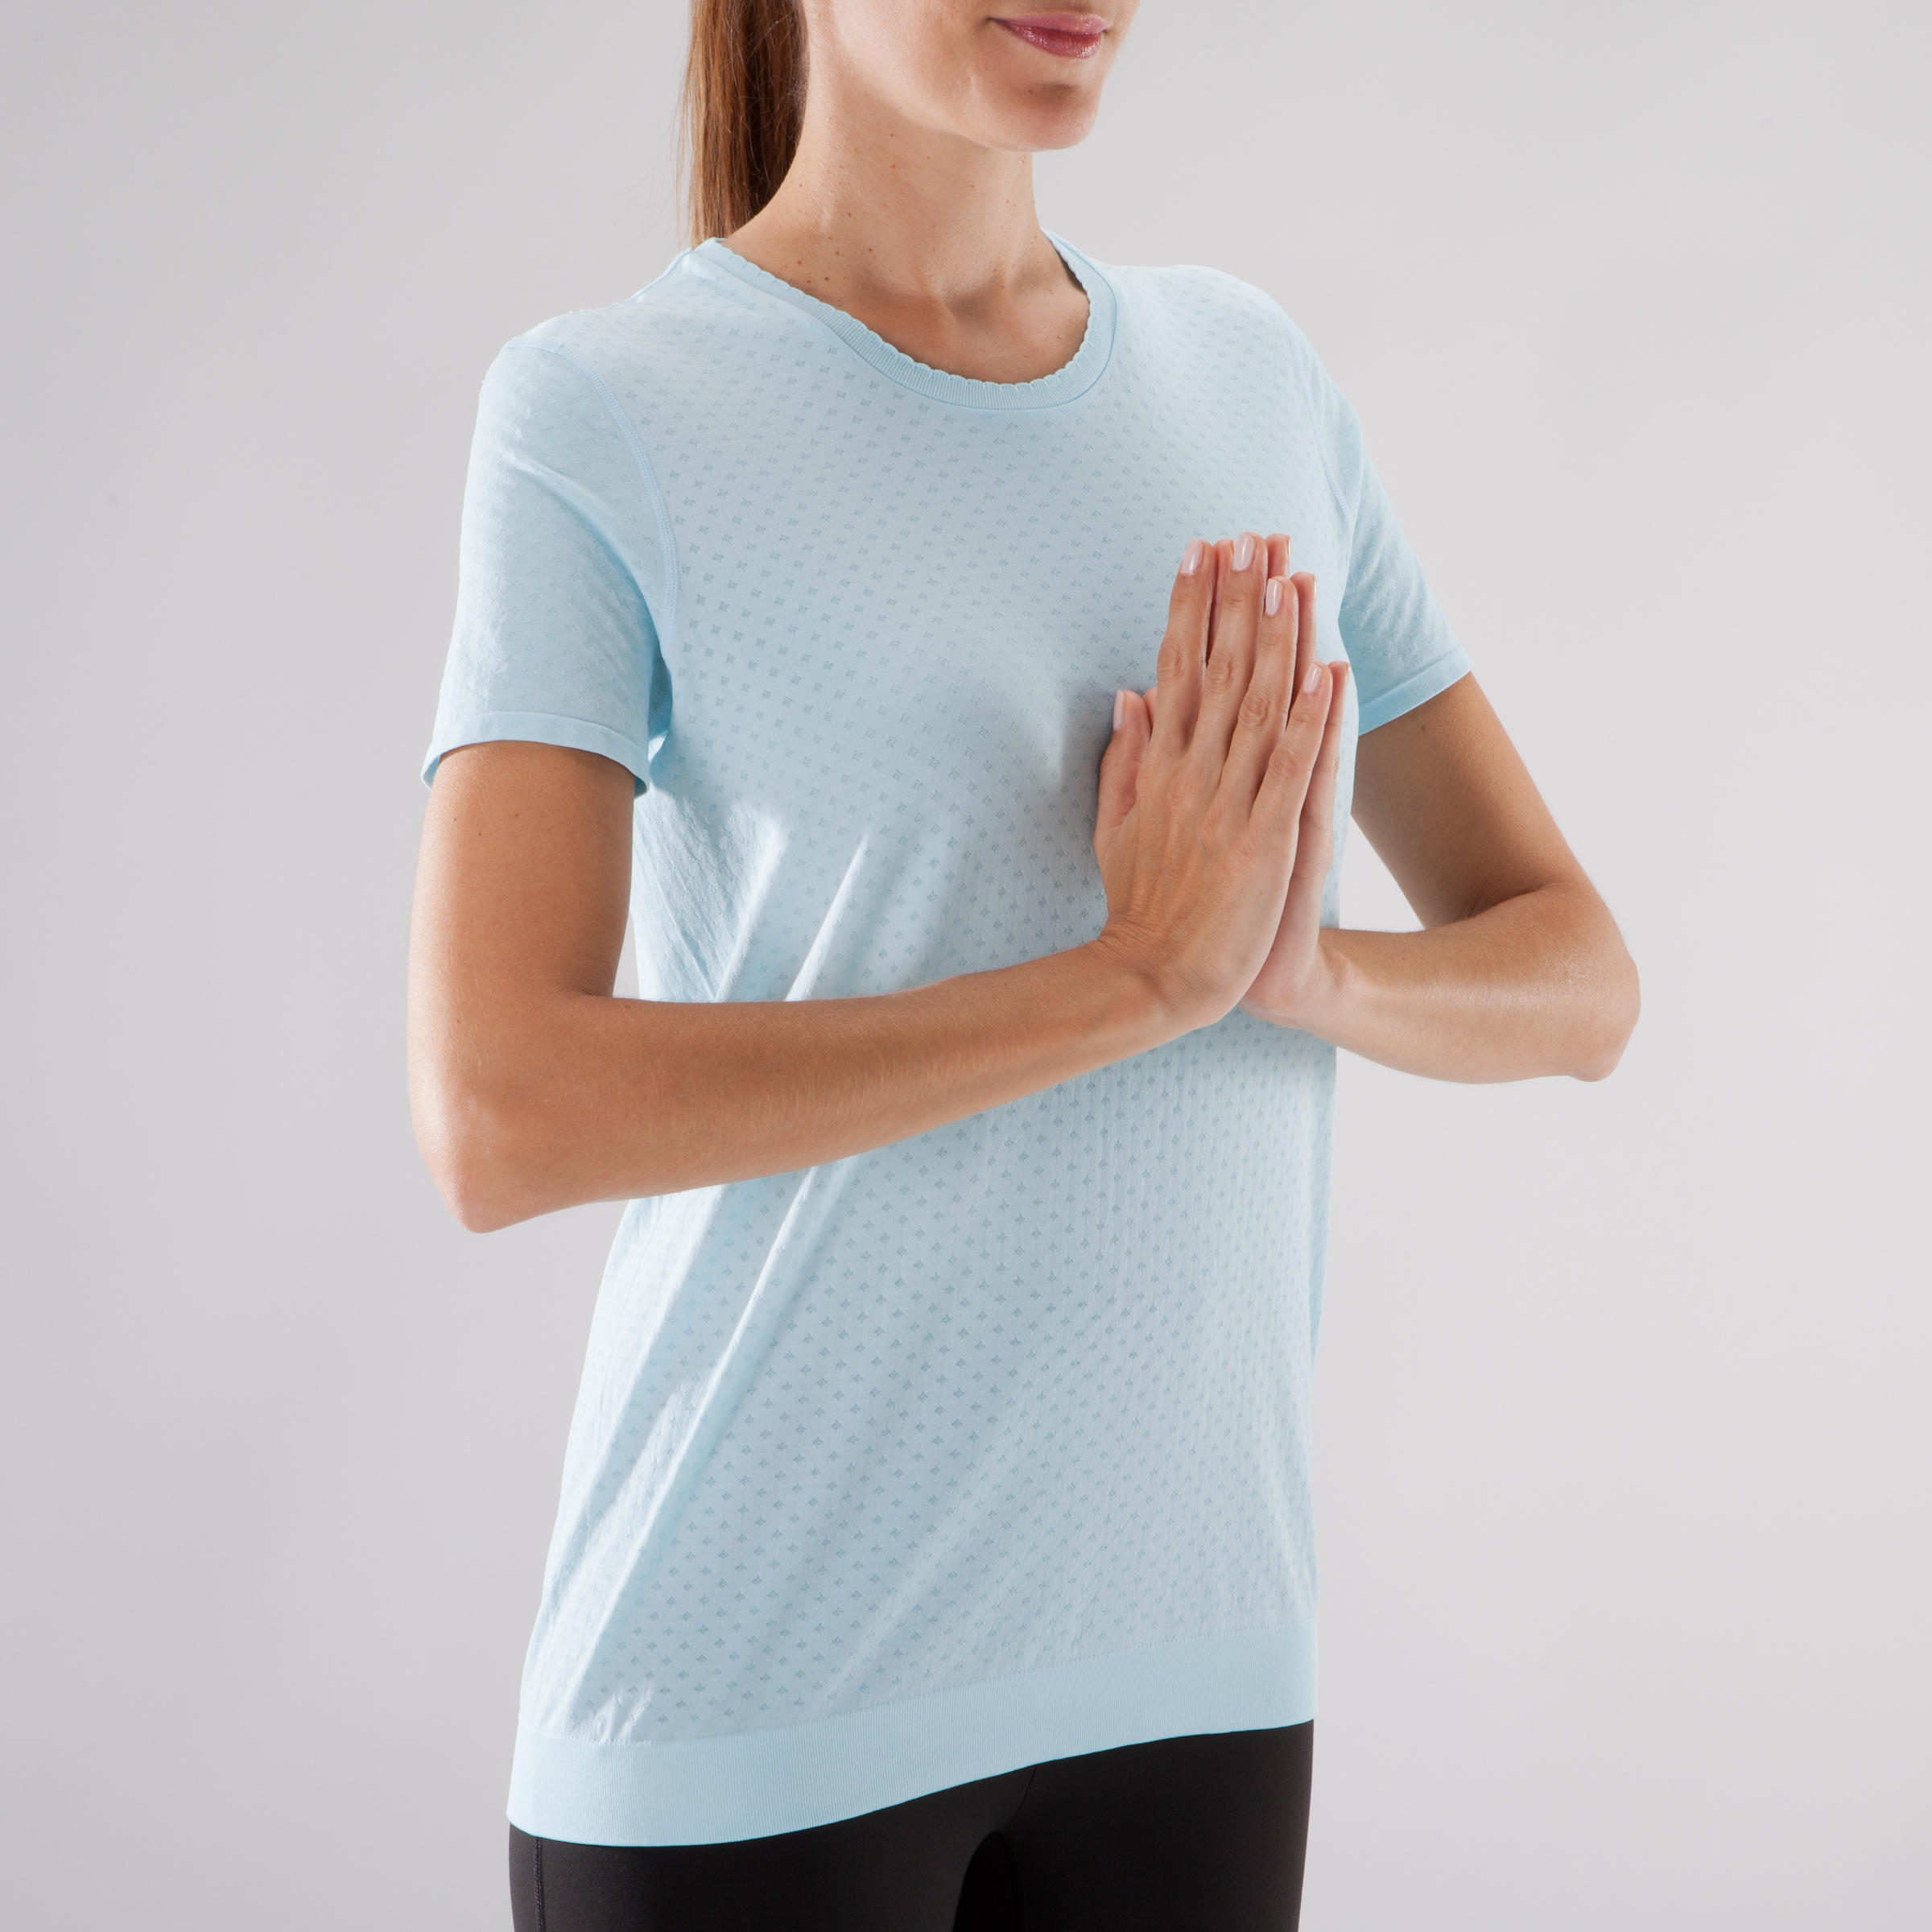 Women's Yoga Seamless T-Shirt - Blue/Grey